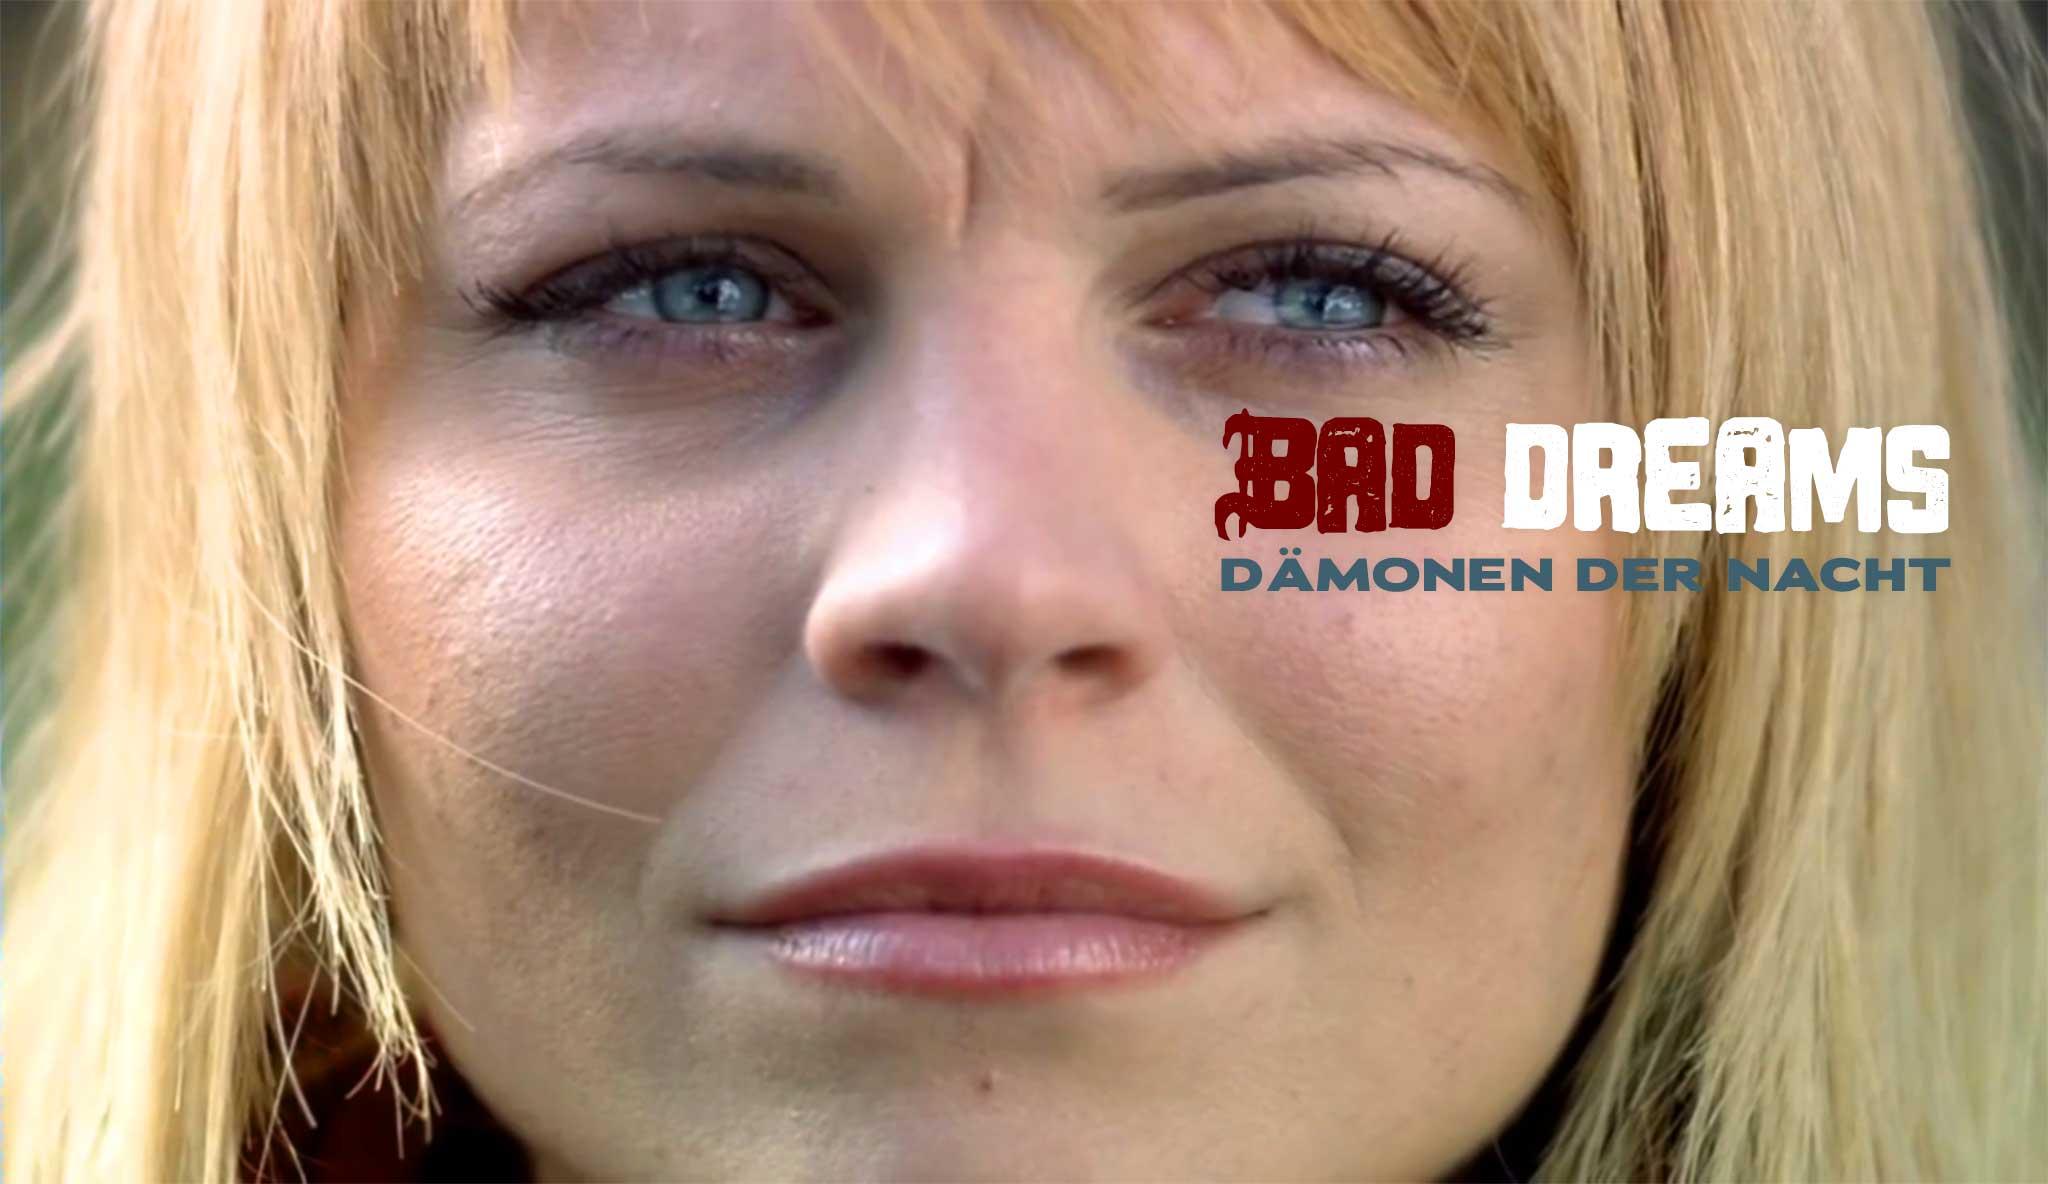 bad-dreams-damonen-der-nacht\header.jpg